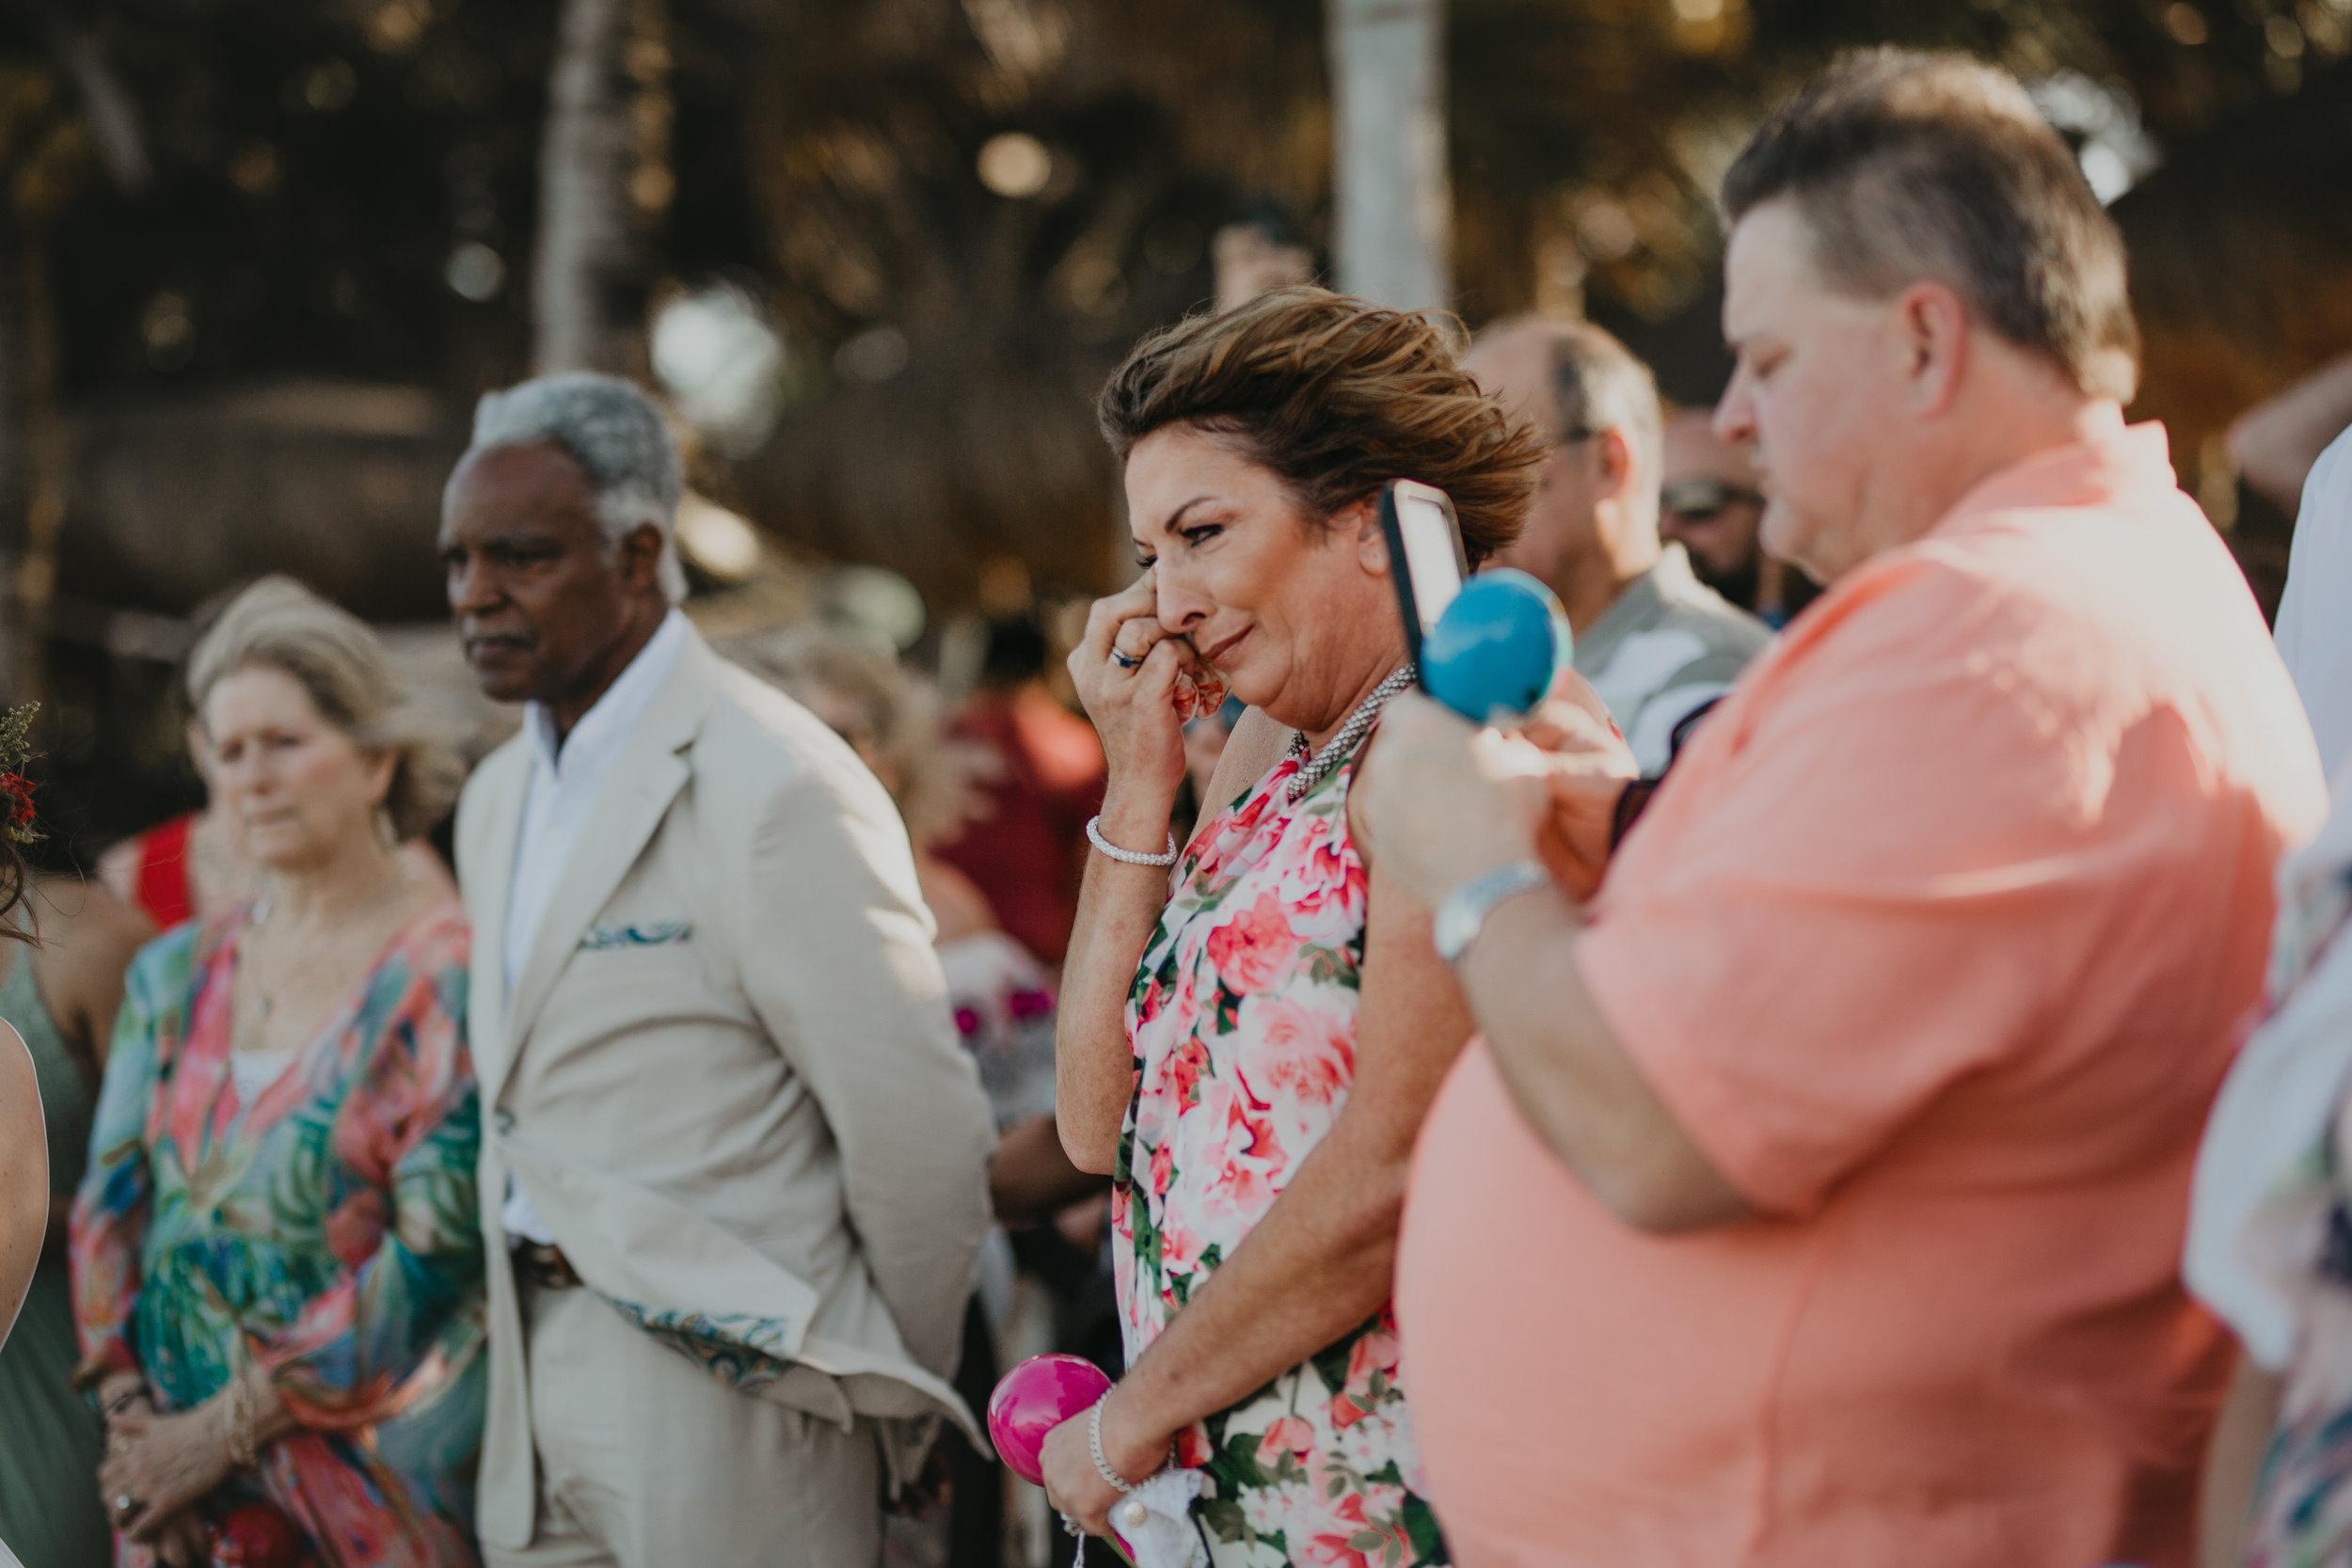 Nicole-Daacke-Photography-beachfront-akumal-destionation-wedding-tulum-mexico-elopement-photographer-destination-wedding-inspiration-sunset-champagne-pop-boho-bride-ocean-tropical-bohemian-tulum-wedding-photos-158.jpg